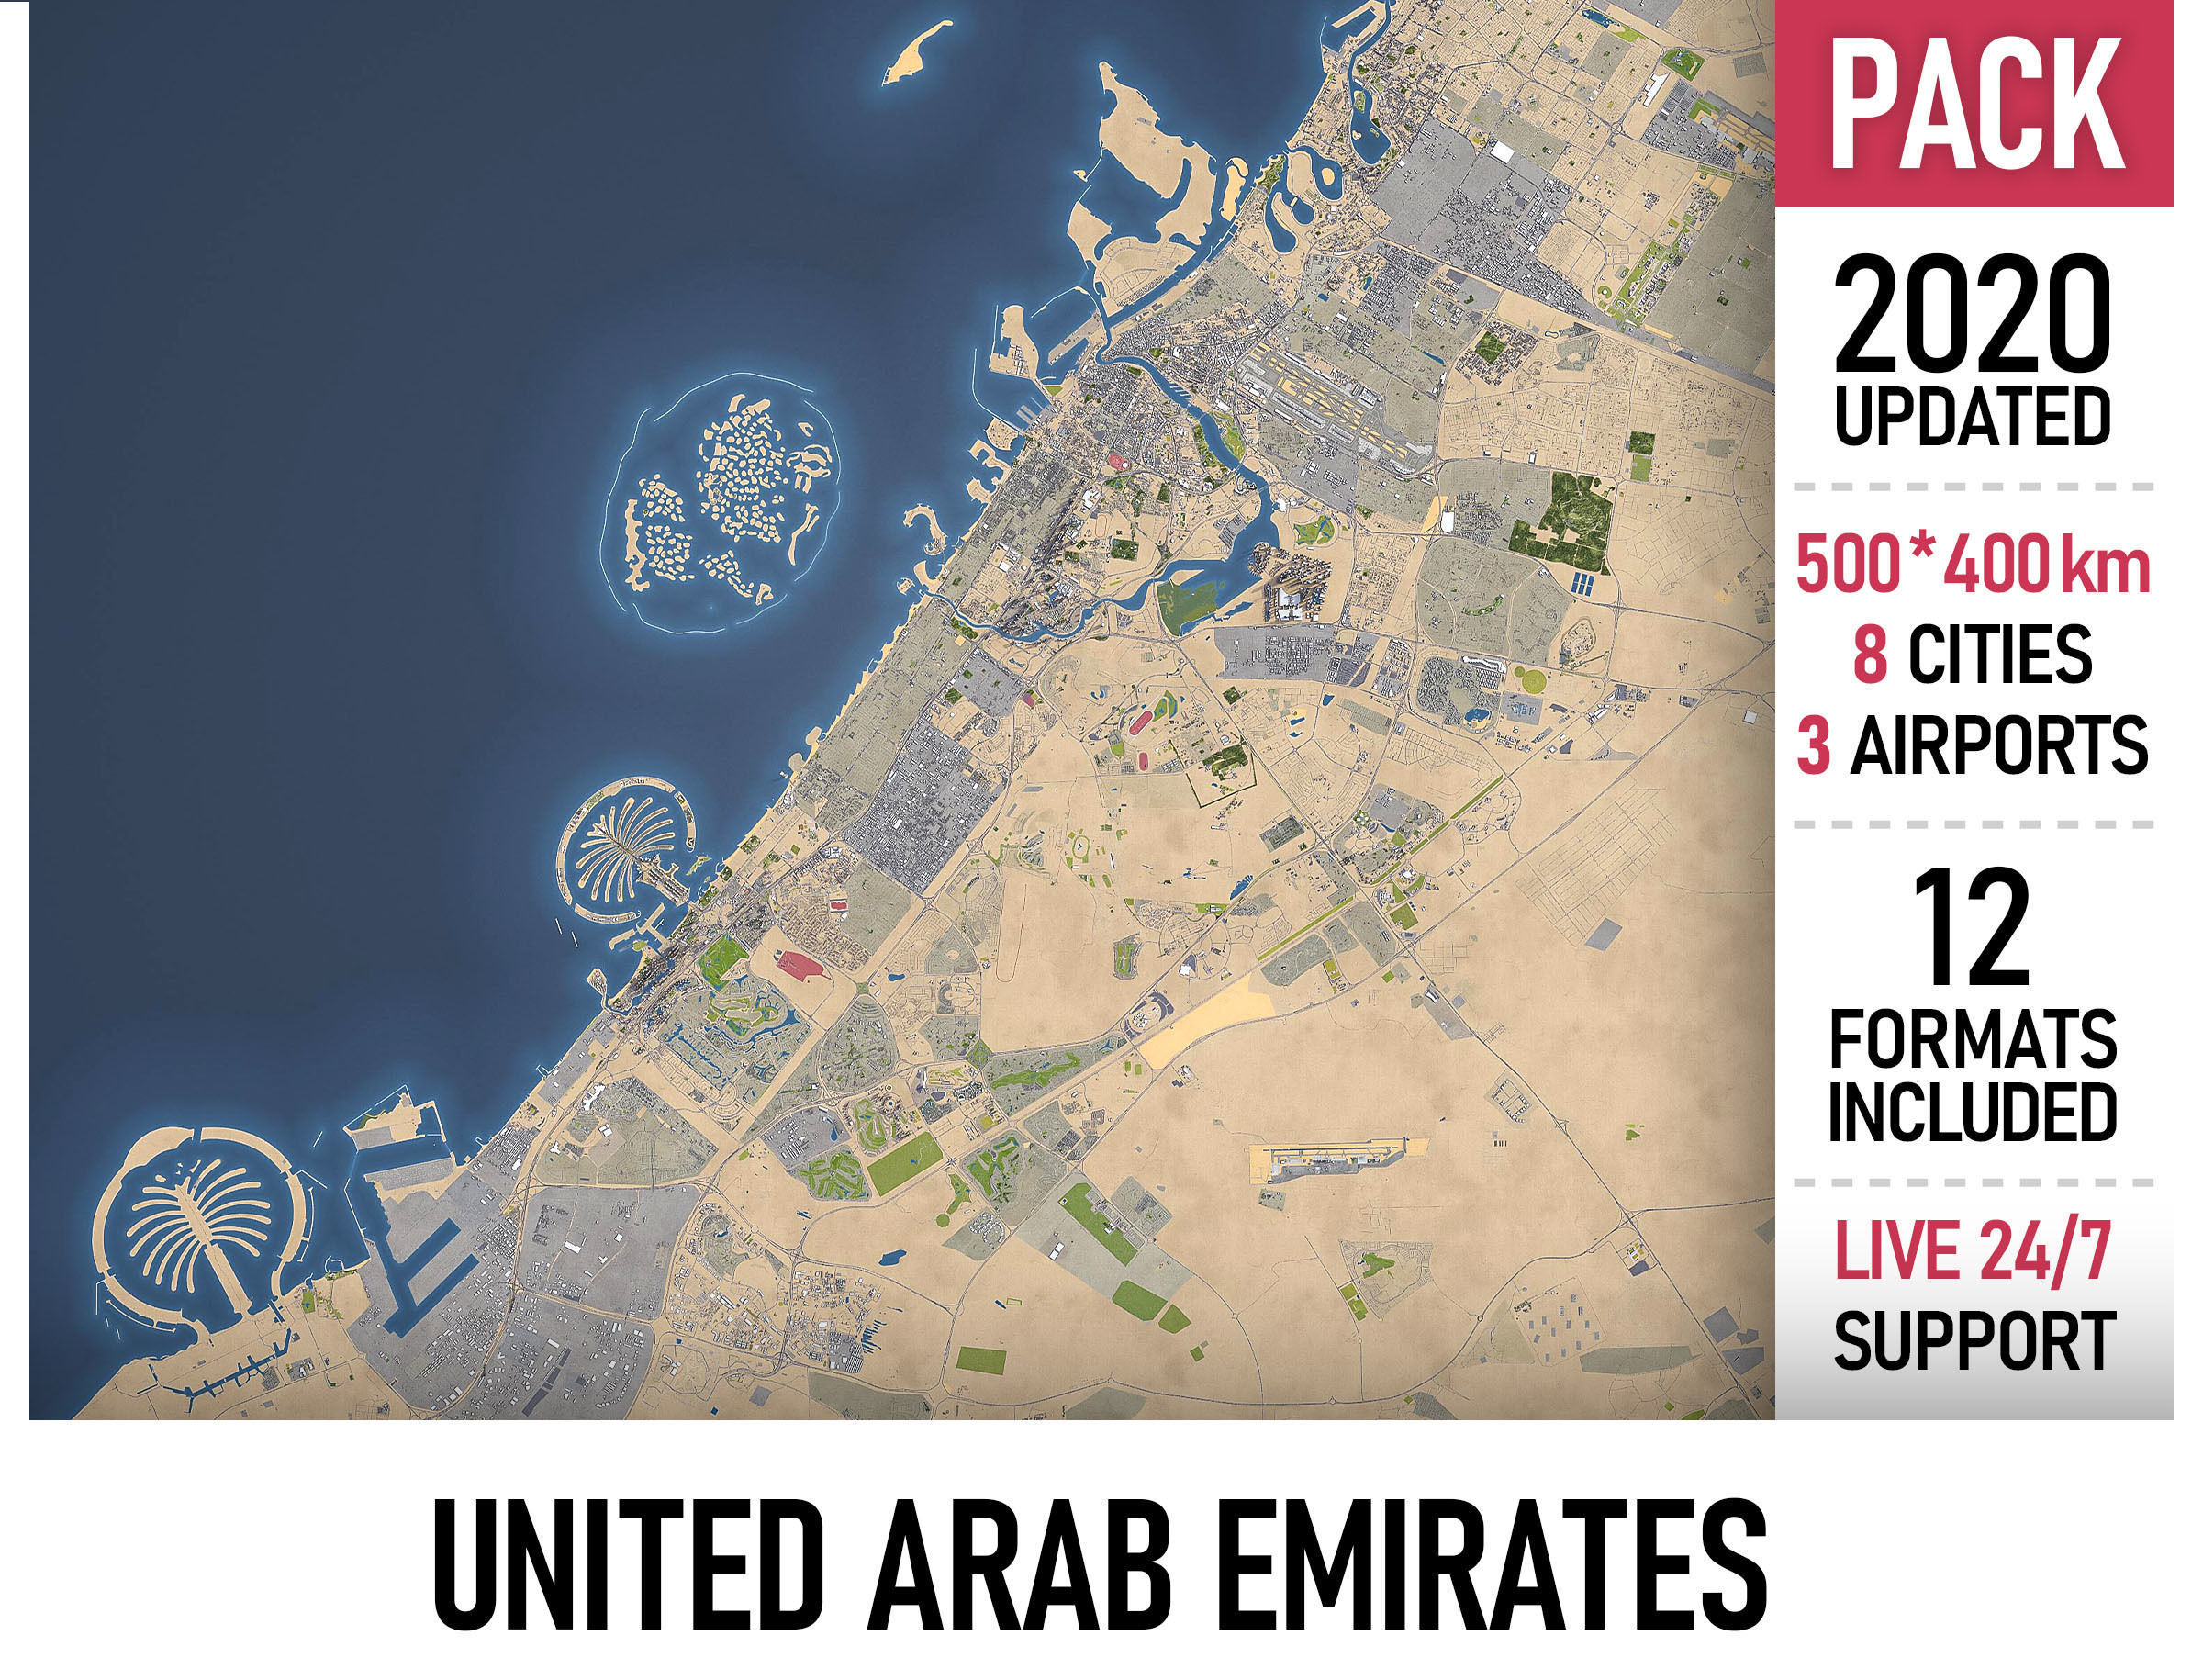 United Arab Emirates - UAE